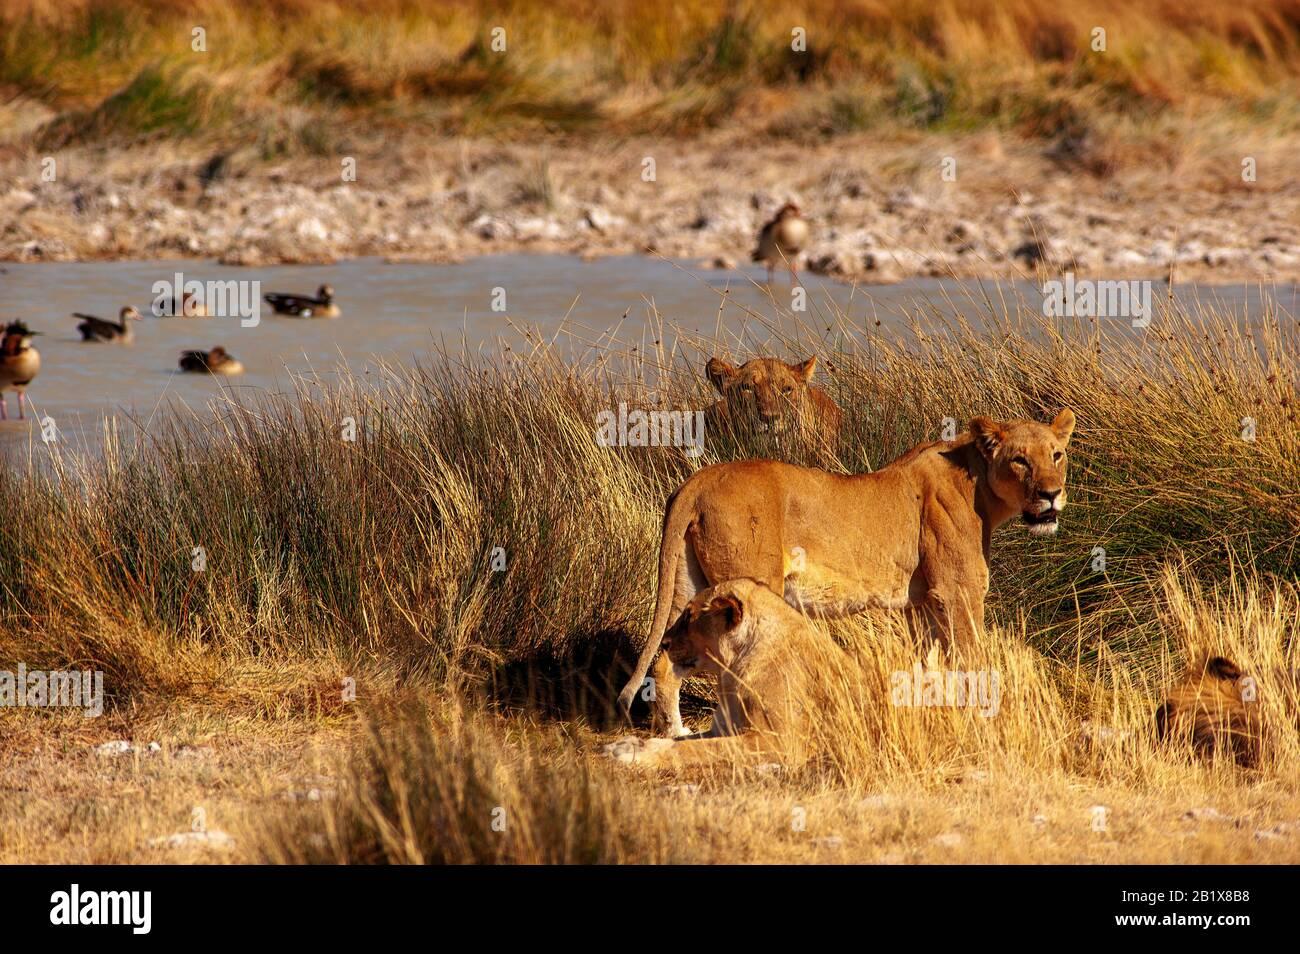 Lions at Salvadora waterhole, Etosha National Park, Namibia Stock Photo